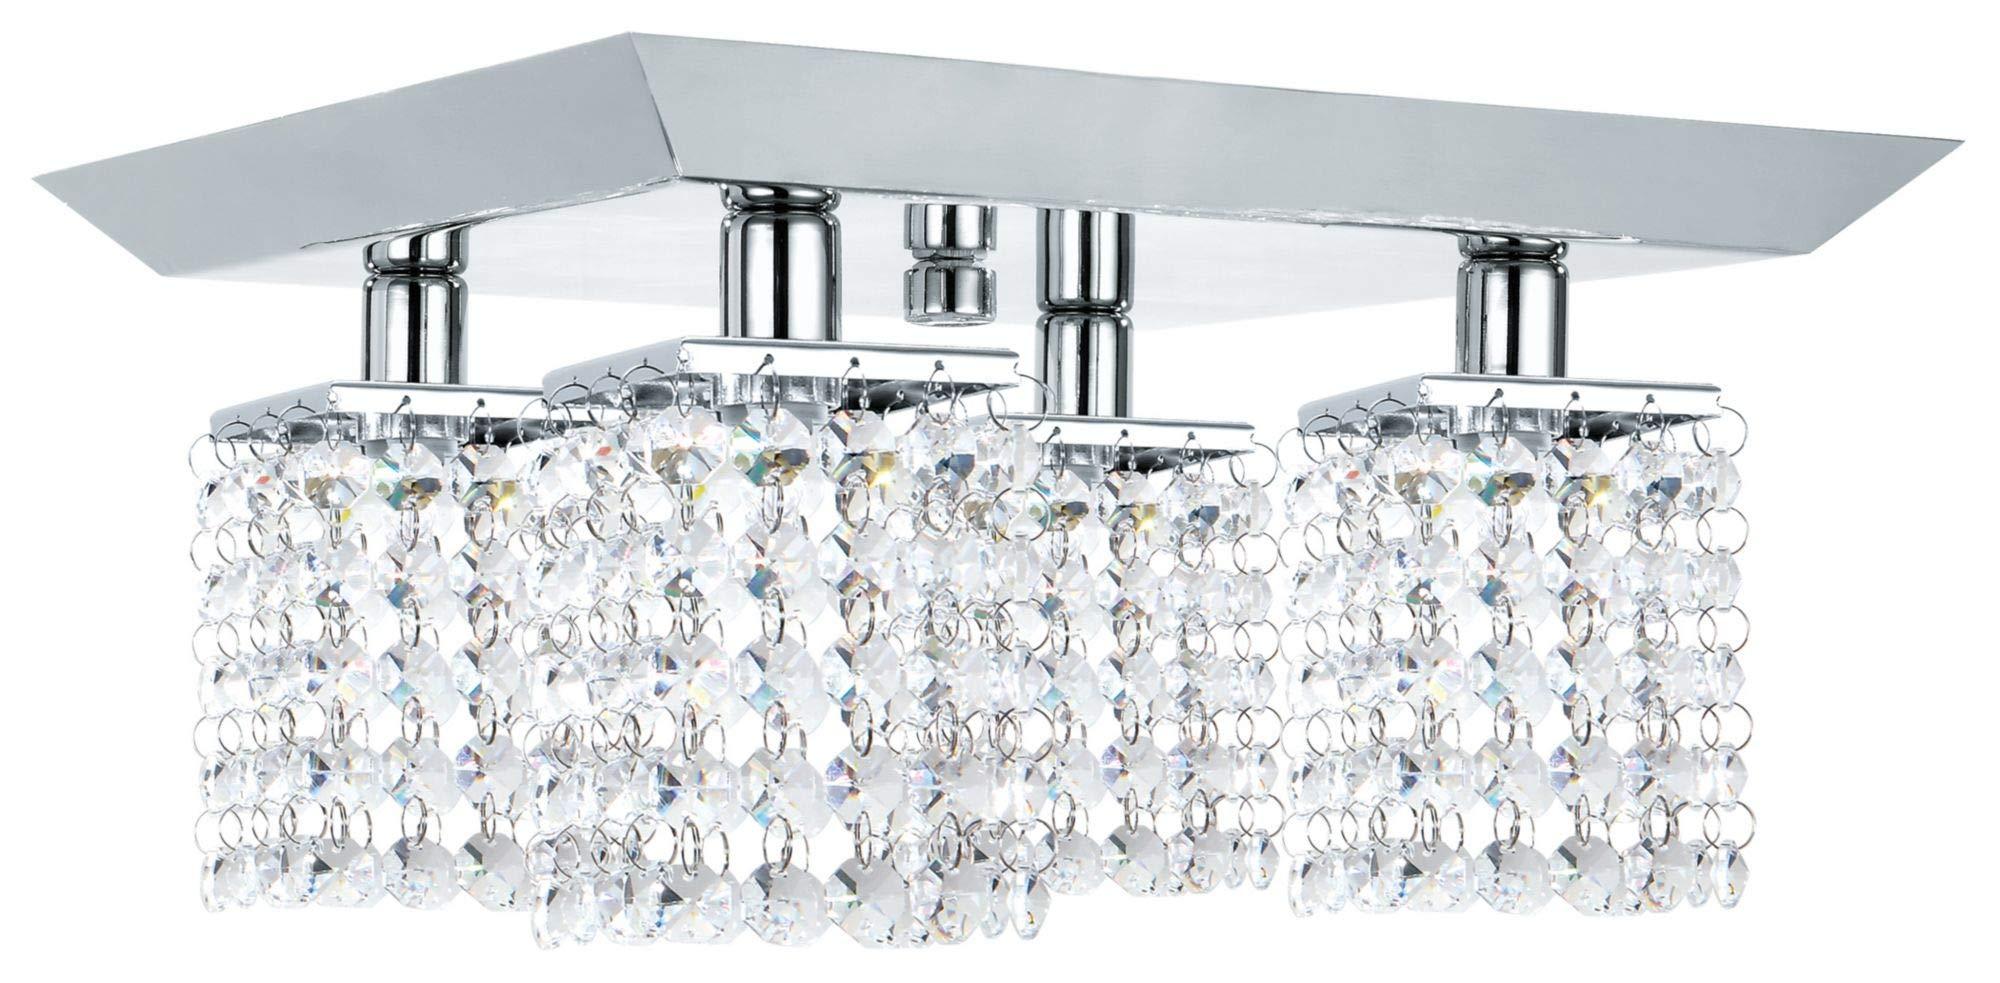 NOMA Track Light Kit | Adjustable Semi-Flush Mount Ceiling Light Fixture | Perfect for Kitchen, Hallway, Living Room & Bedroom | Crystal Finish, 4-Light